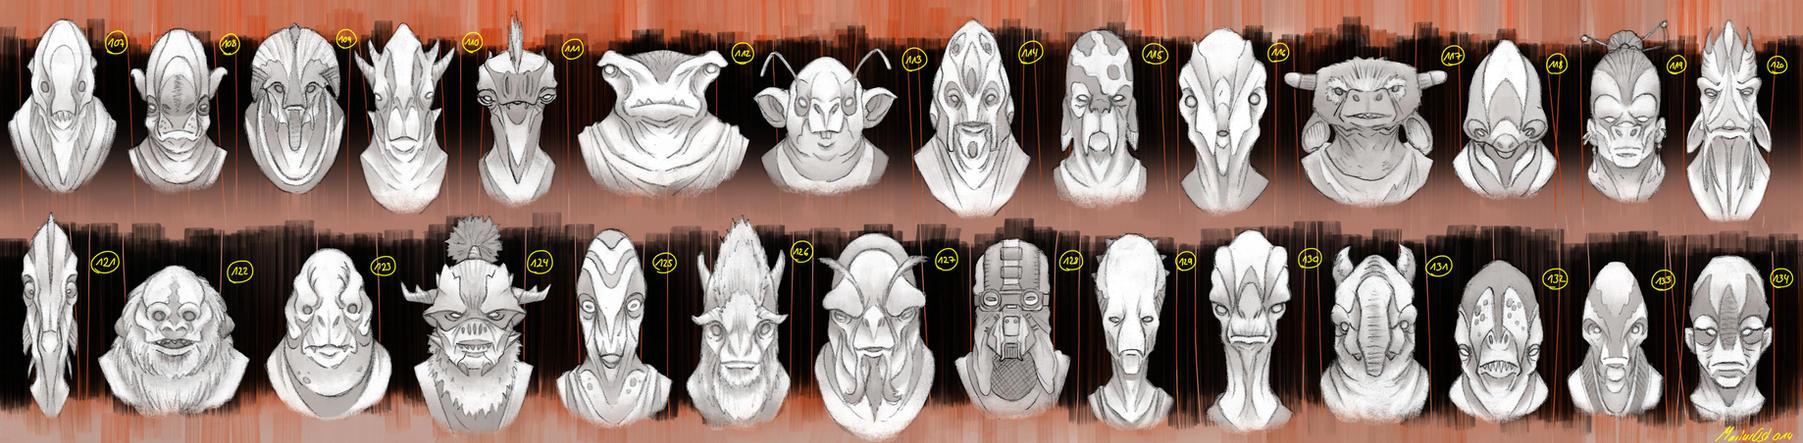 Alien Heads 4 by Kogane801